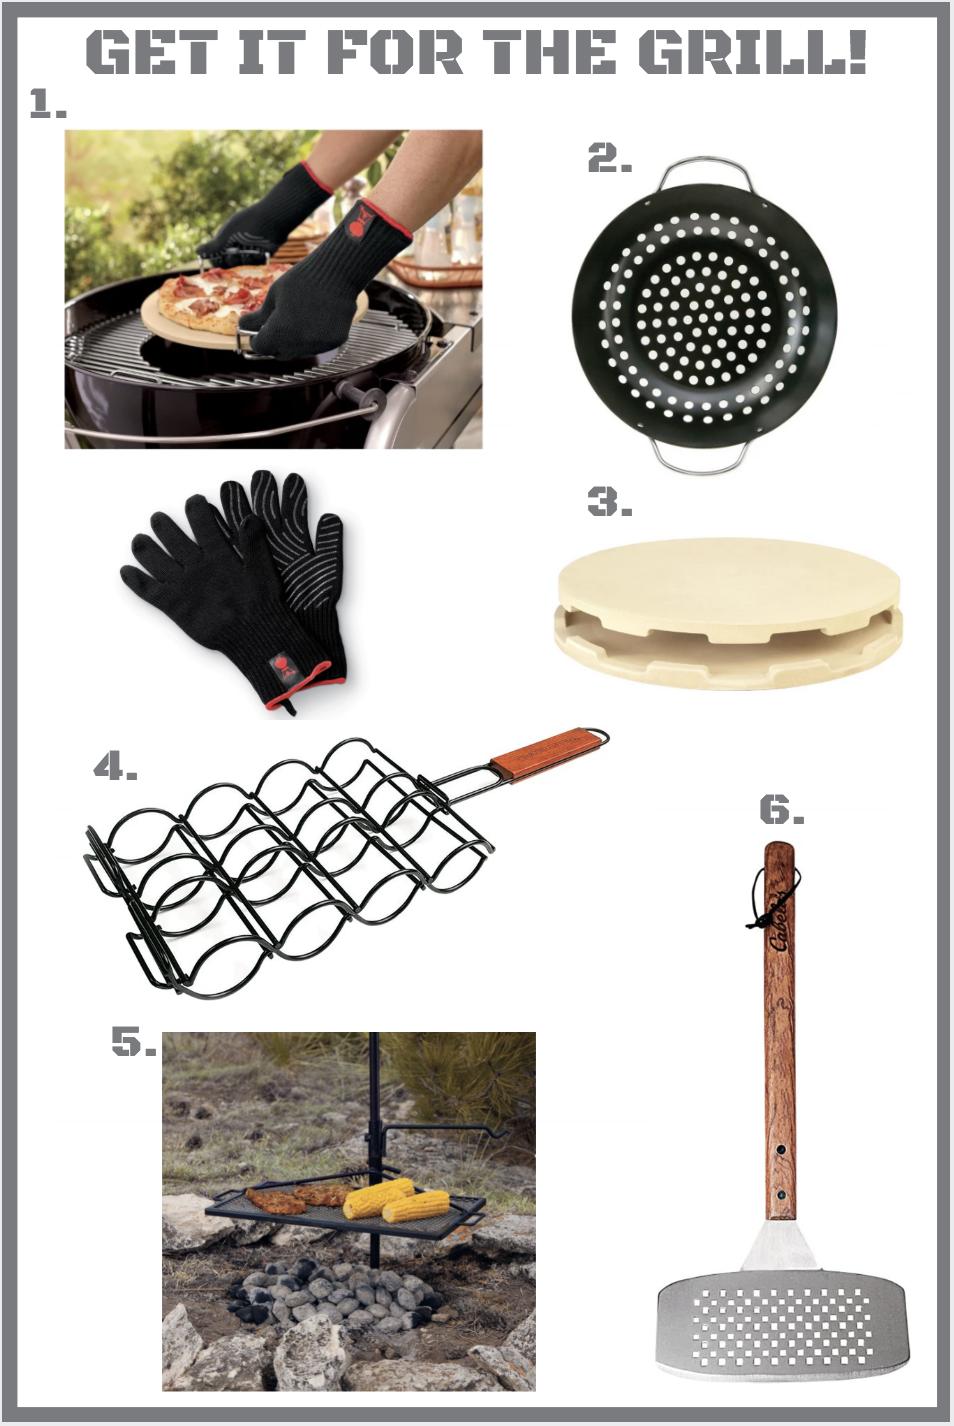 Best Grilling Gifts | Jana Donohoe Designs | Fayetteville North Carolina | www.janadonohoedesigns.com